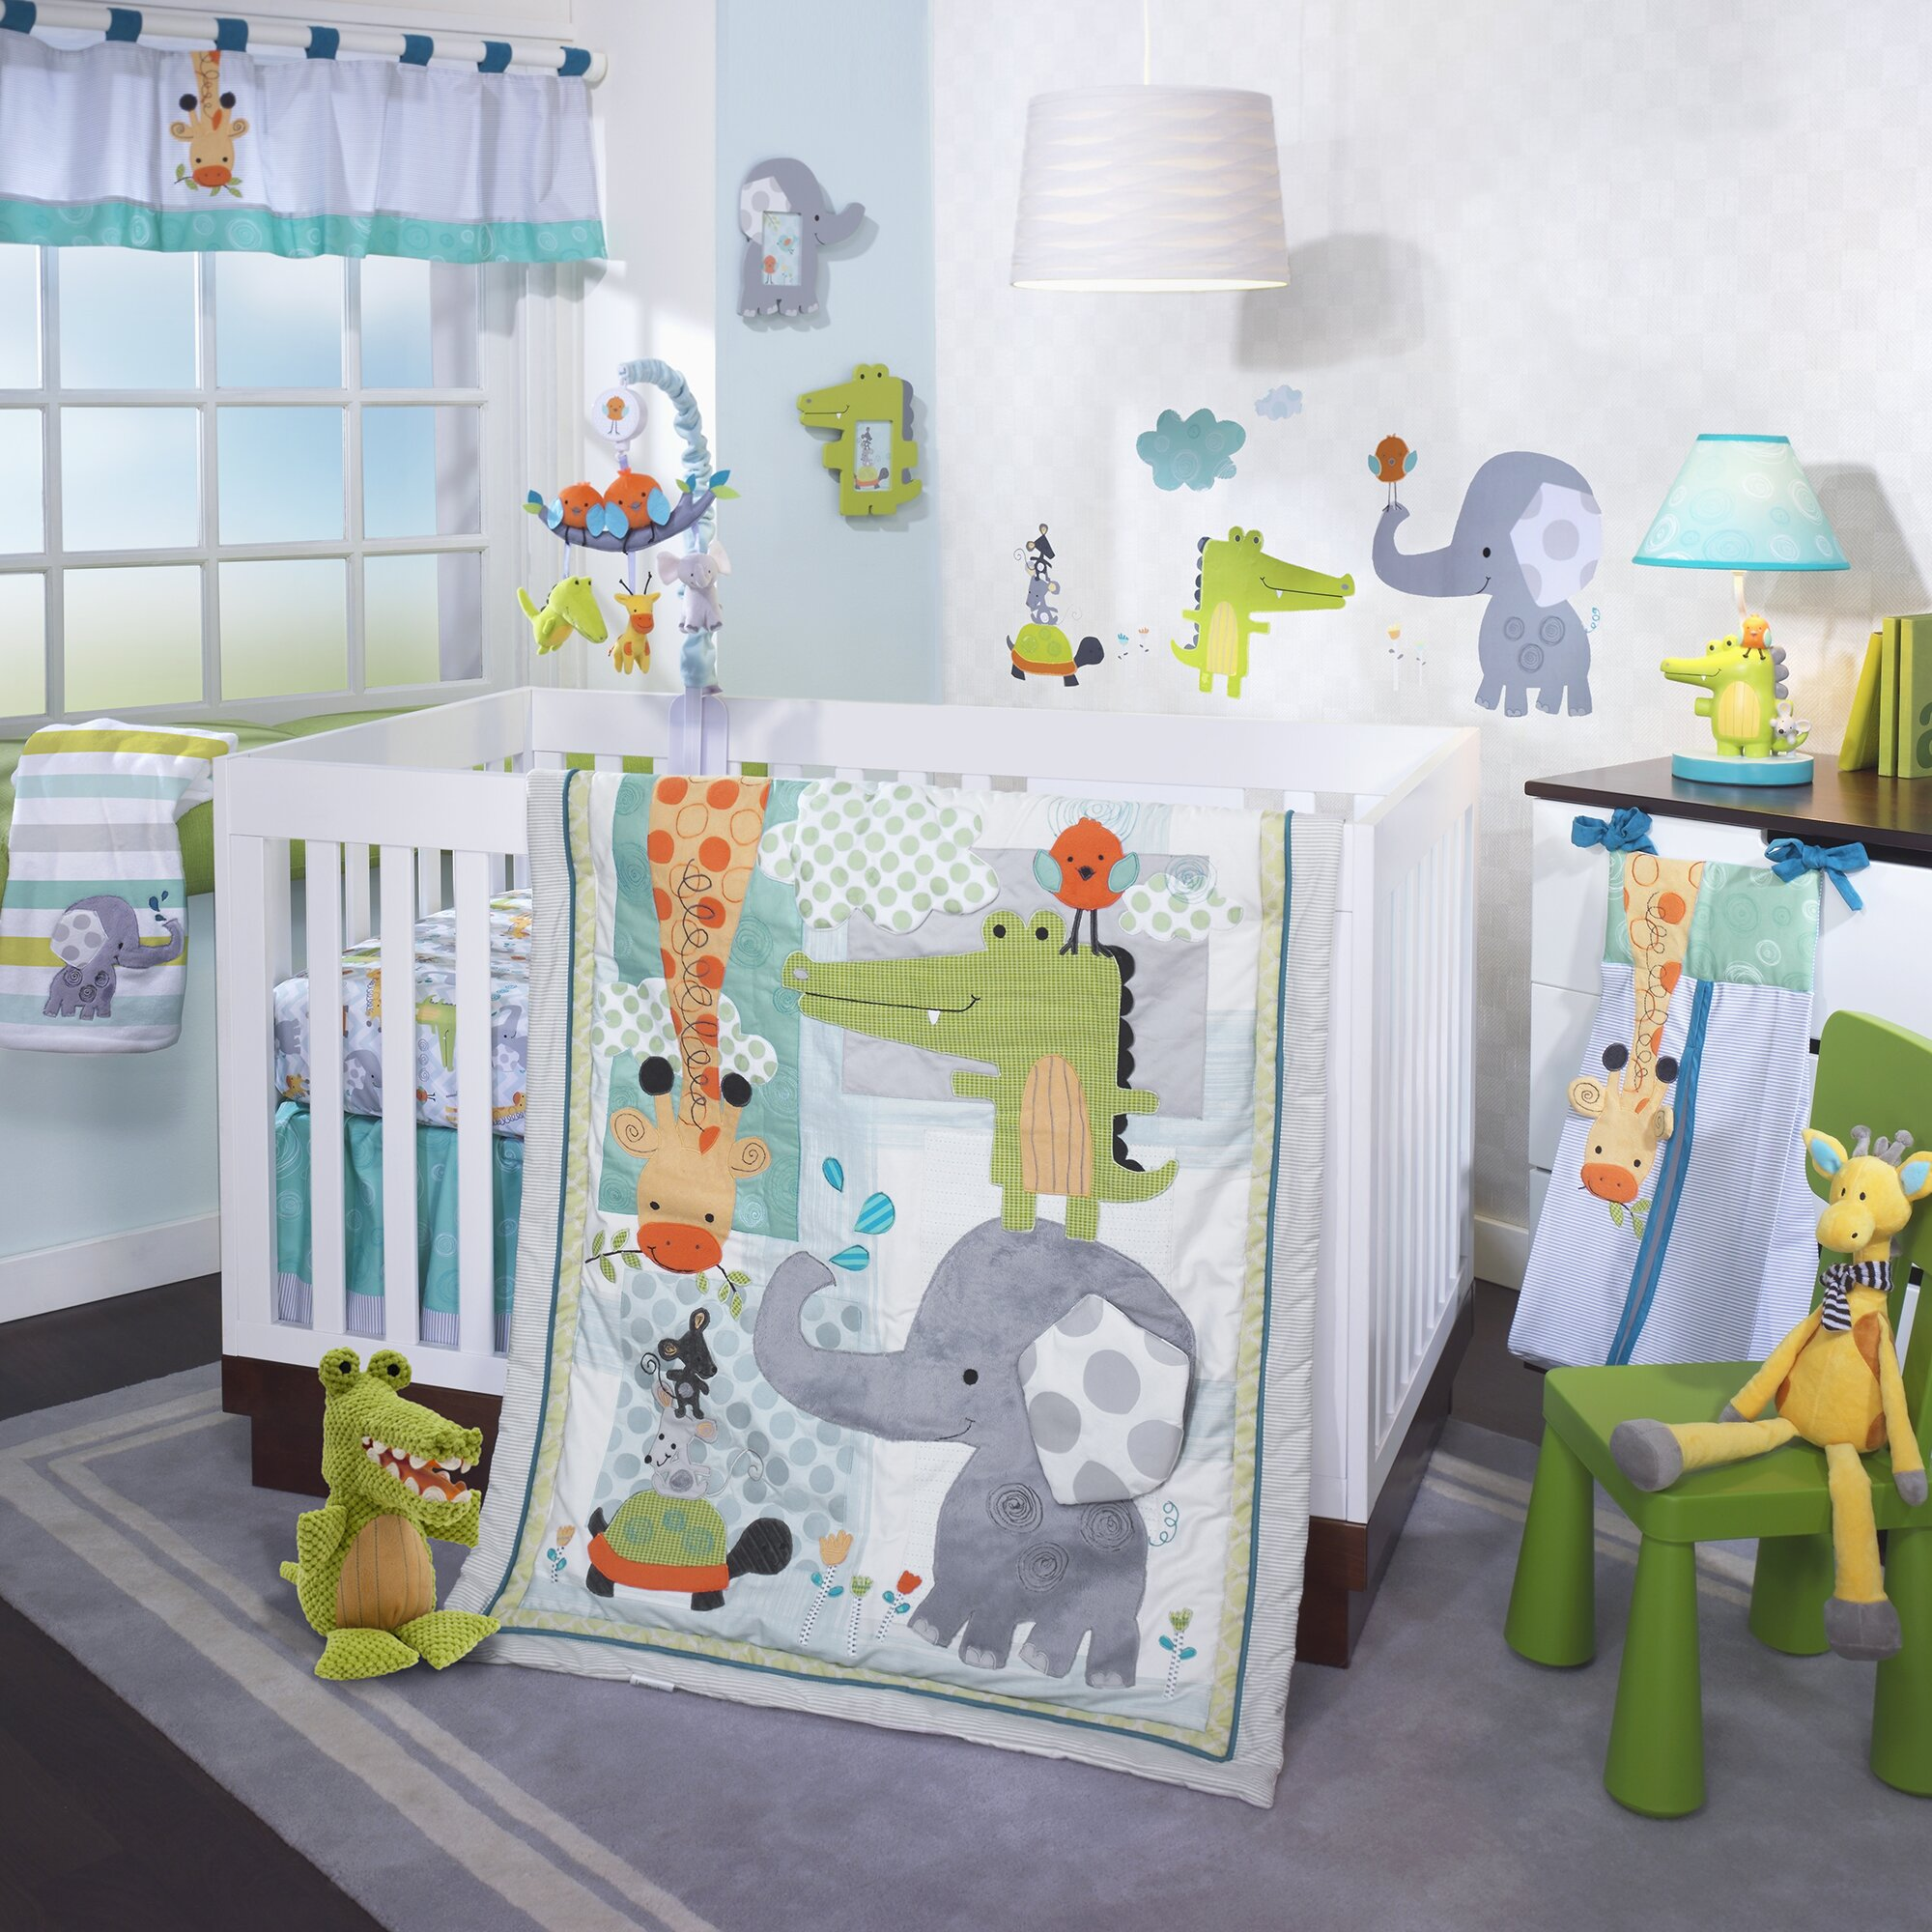 Crib for sale orlando fl - Lambs Amp Ivy Yoo Hoo 4 Piece Crib Bedding Set